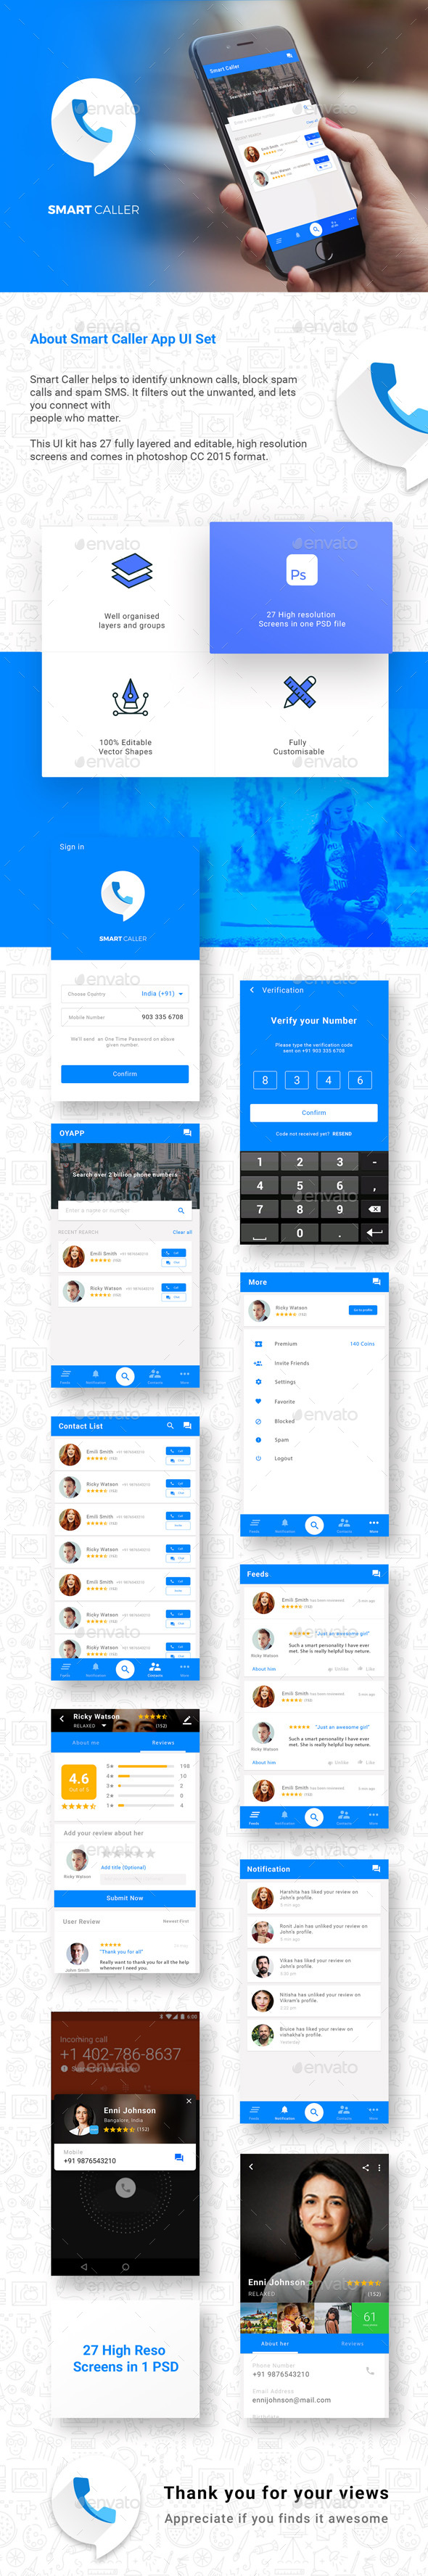 Caller ID & Chatting App like Truecaller |  Smart Caller  |  Modern Design - User Interfaces Web Elements